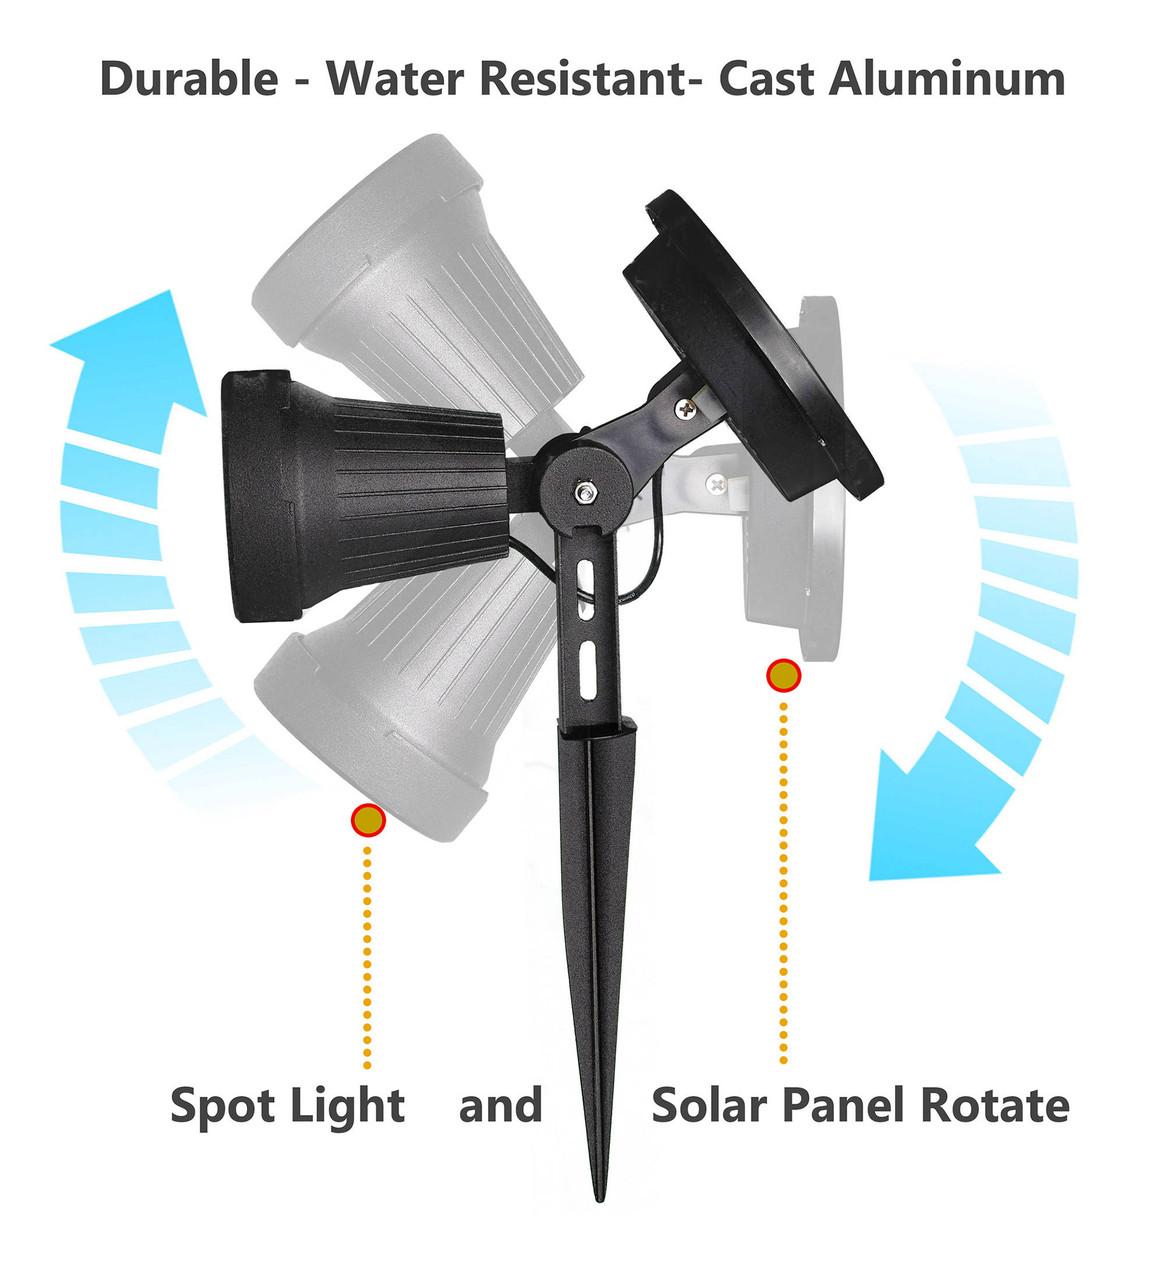 Classy Caps' Black High Performance Solar Spotlight Range Illustration